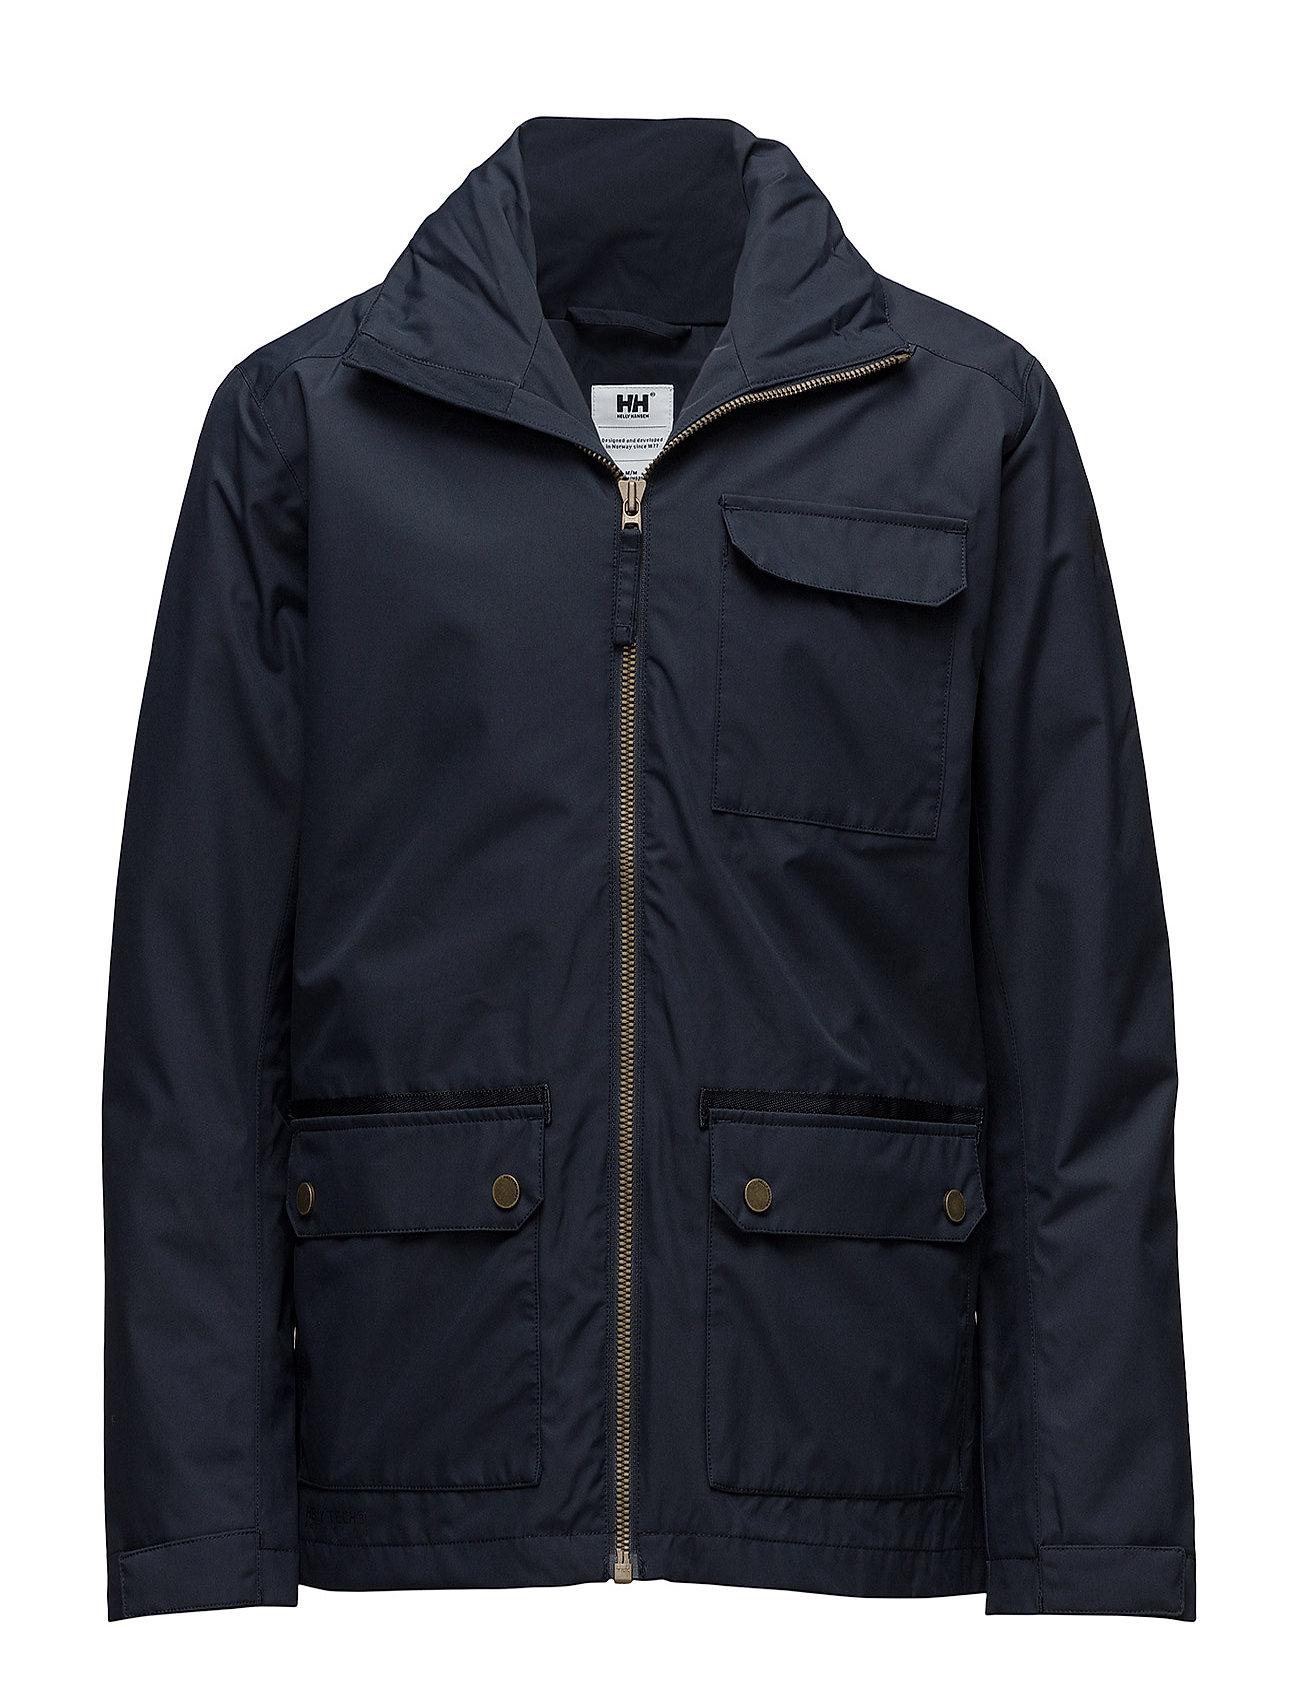 HELLY HANSEN Highlands Jacket Parka Jacke Blau HELLY HANSEN